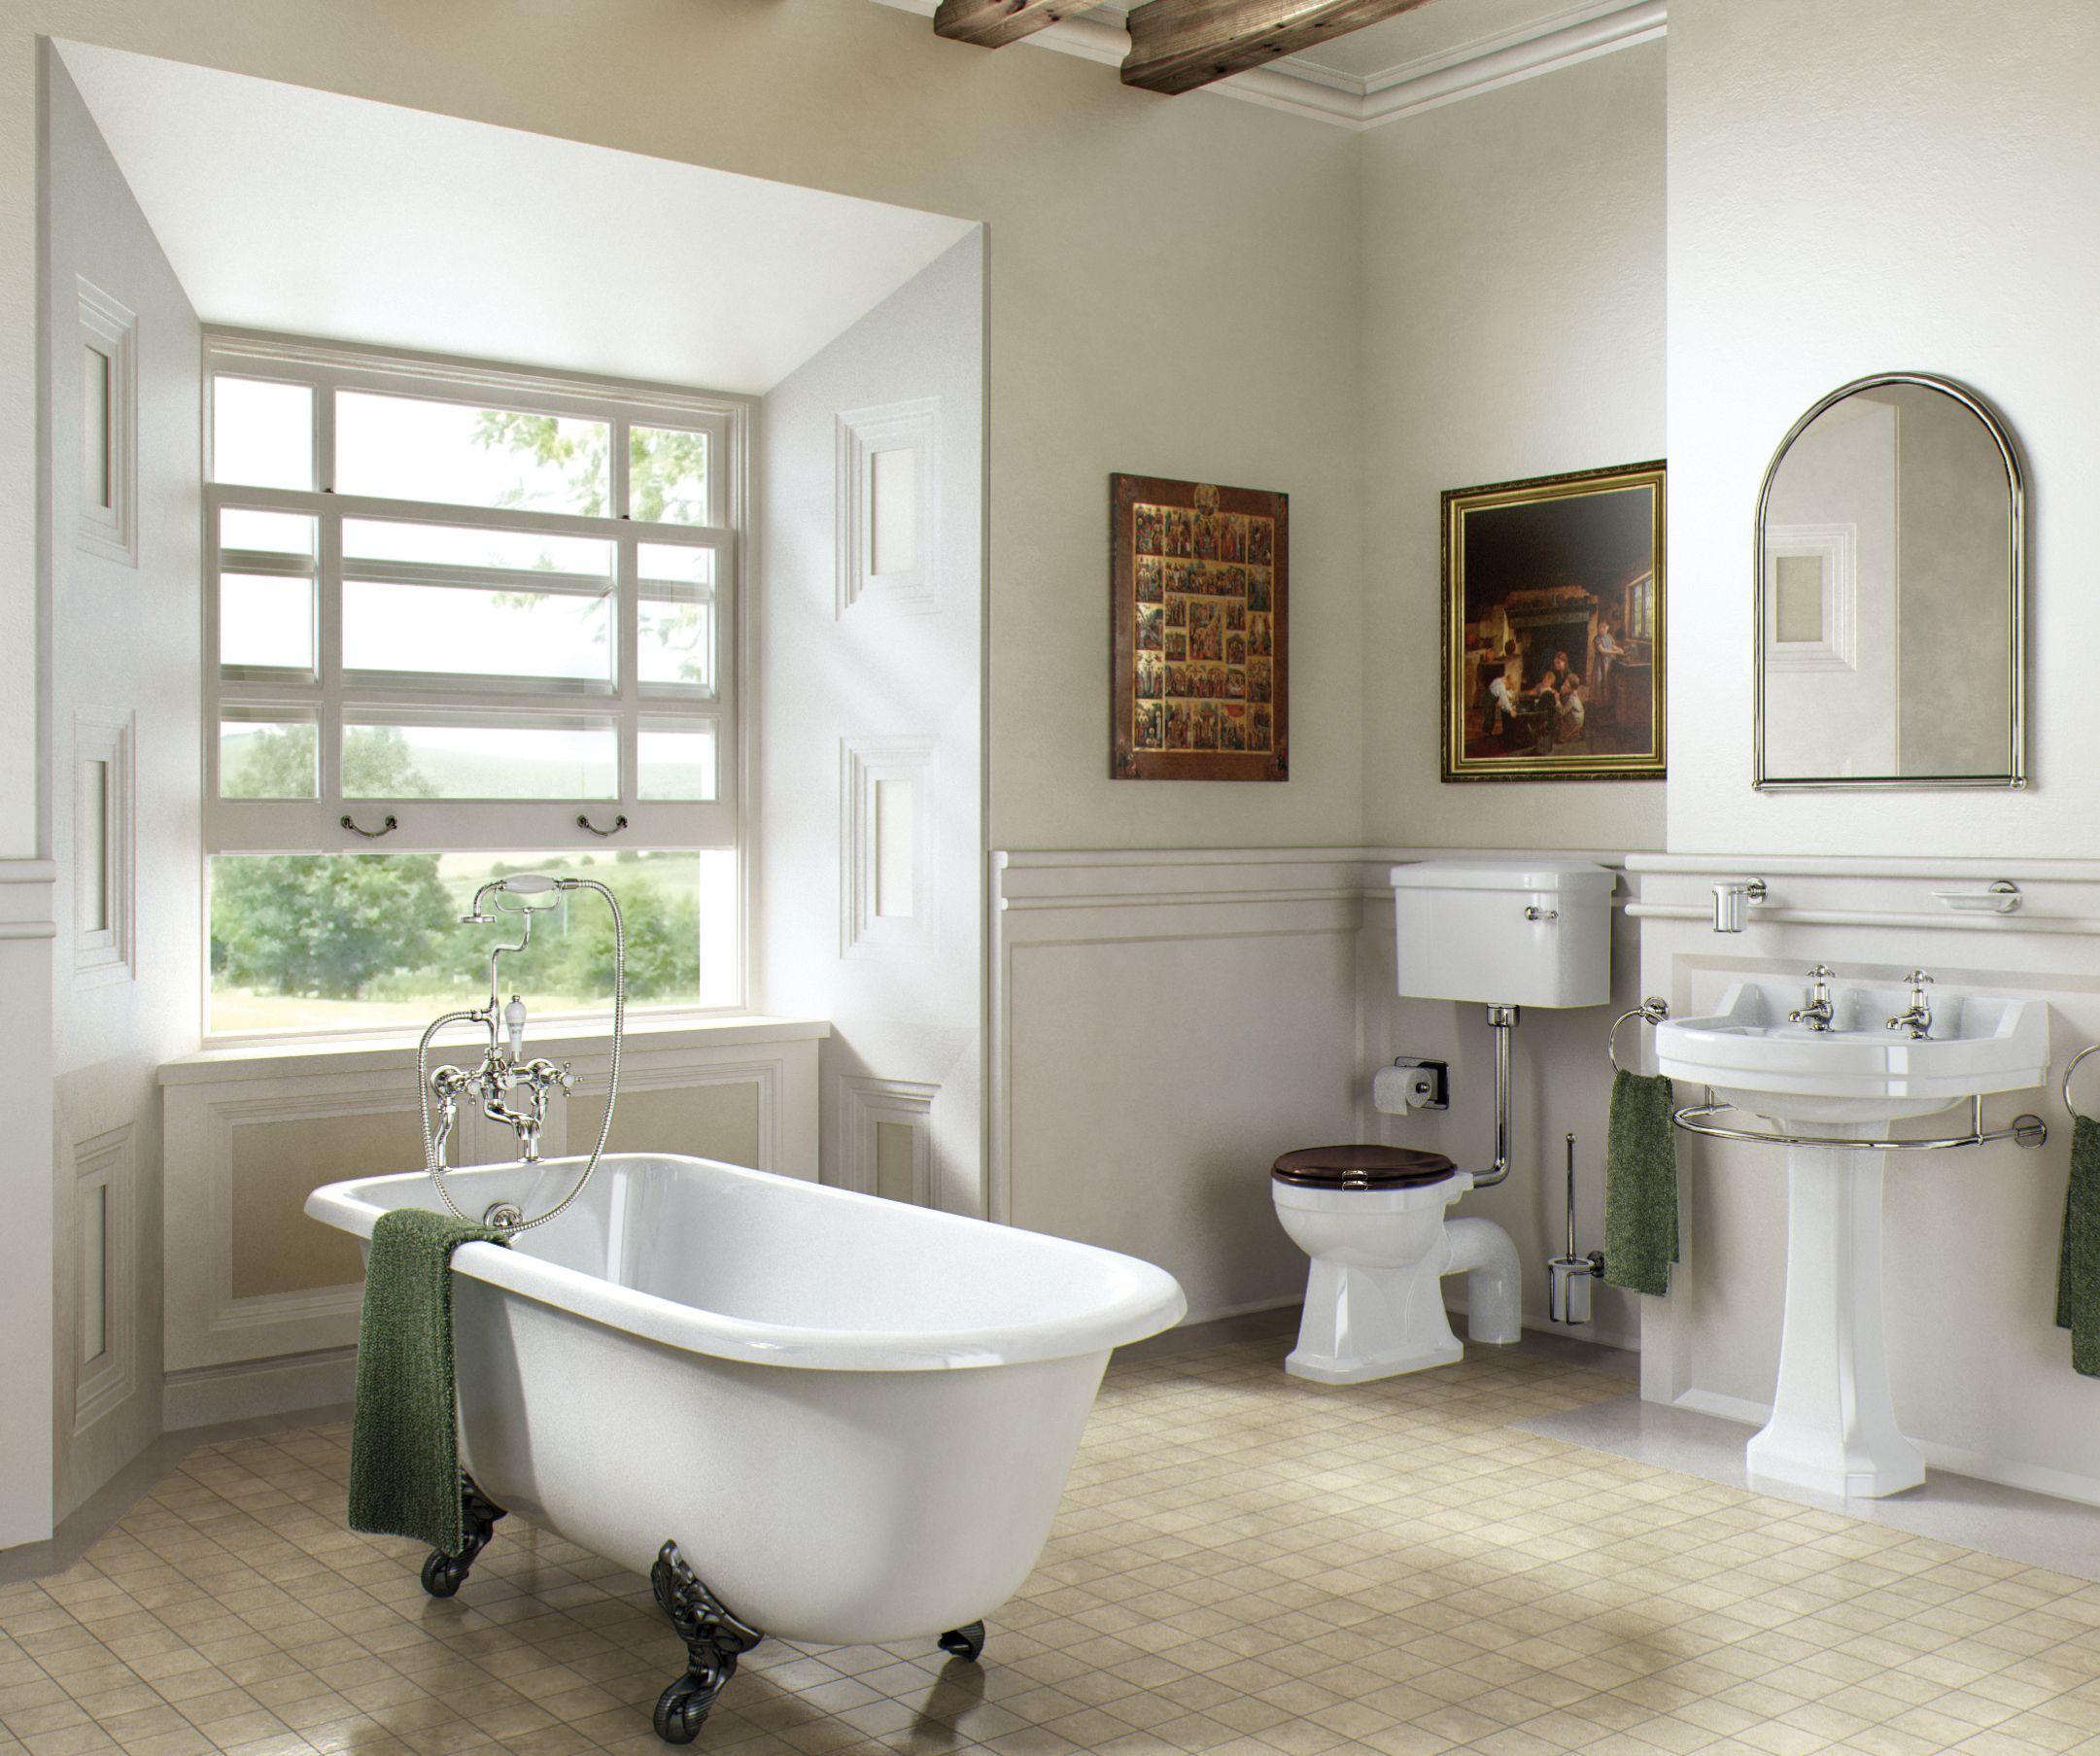 Edwardian Bathroom Design hen how to Home Decorating Ideas